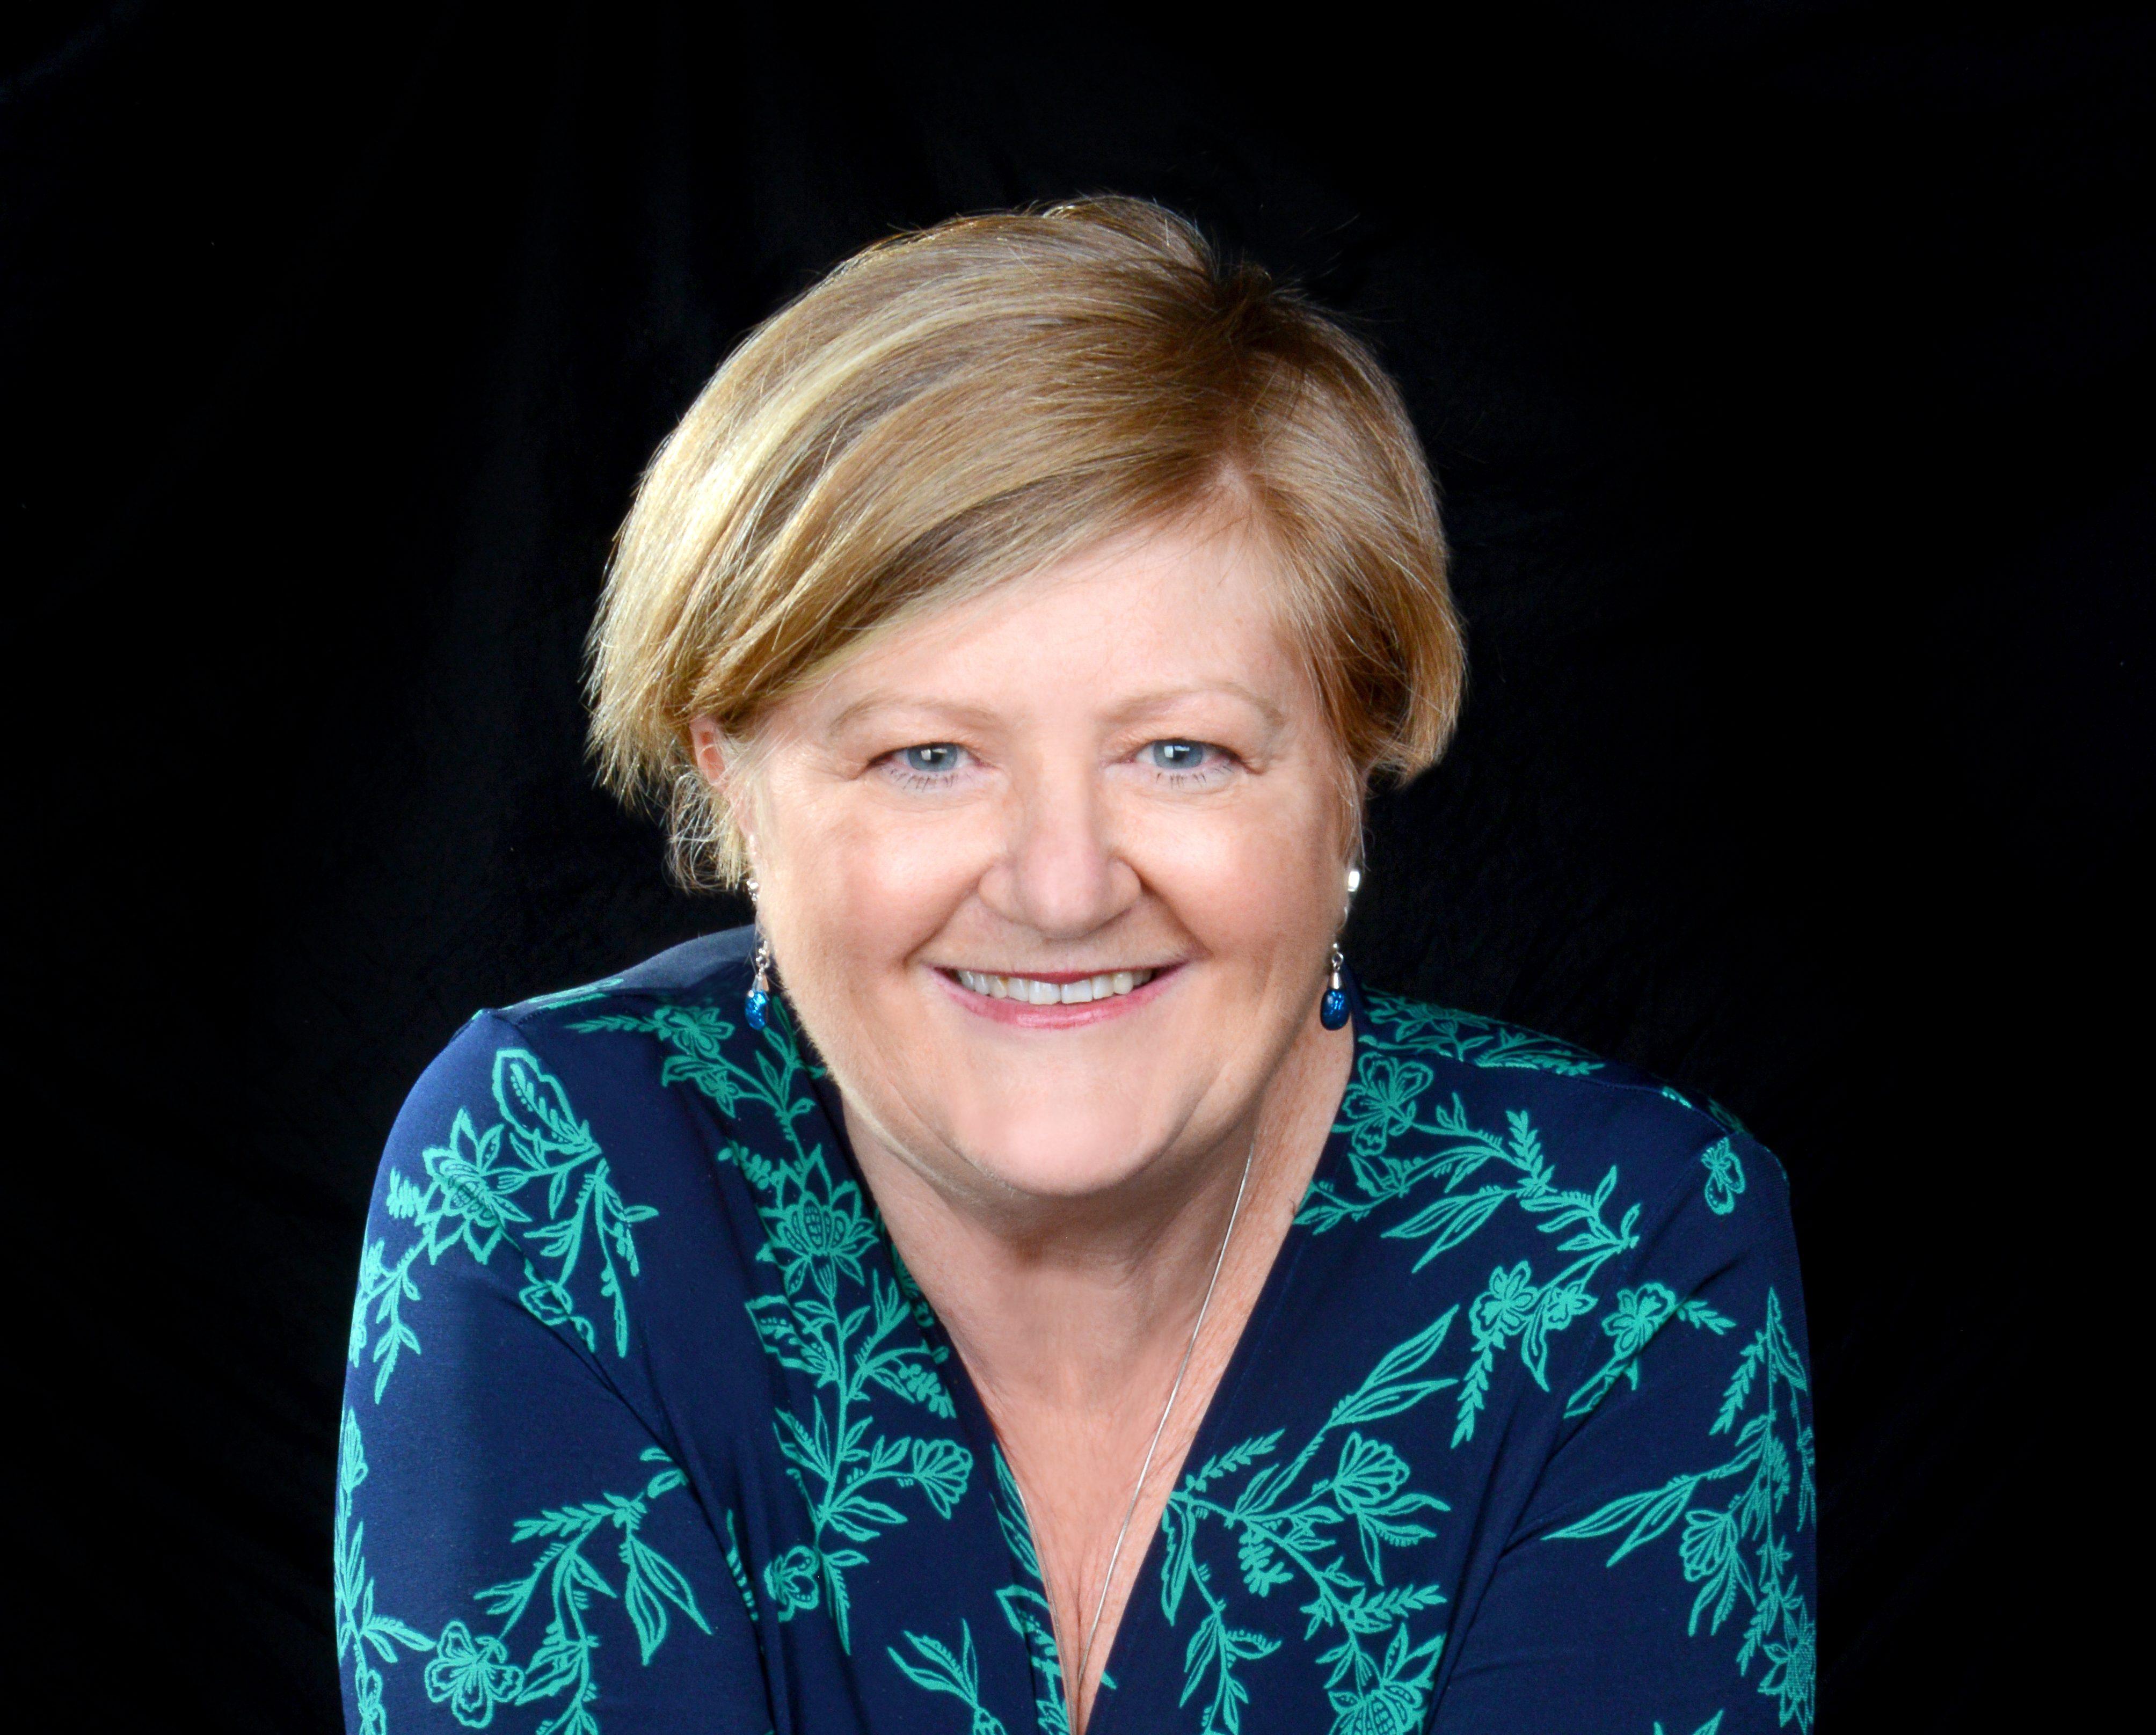 Michelle Bourke